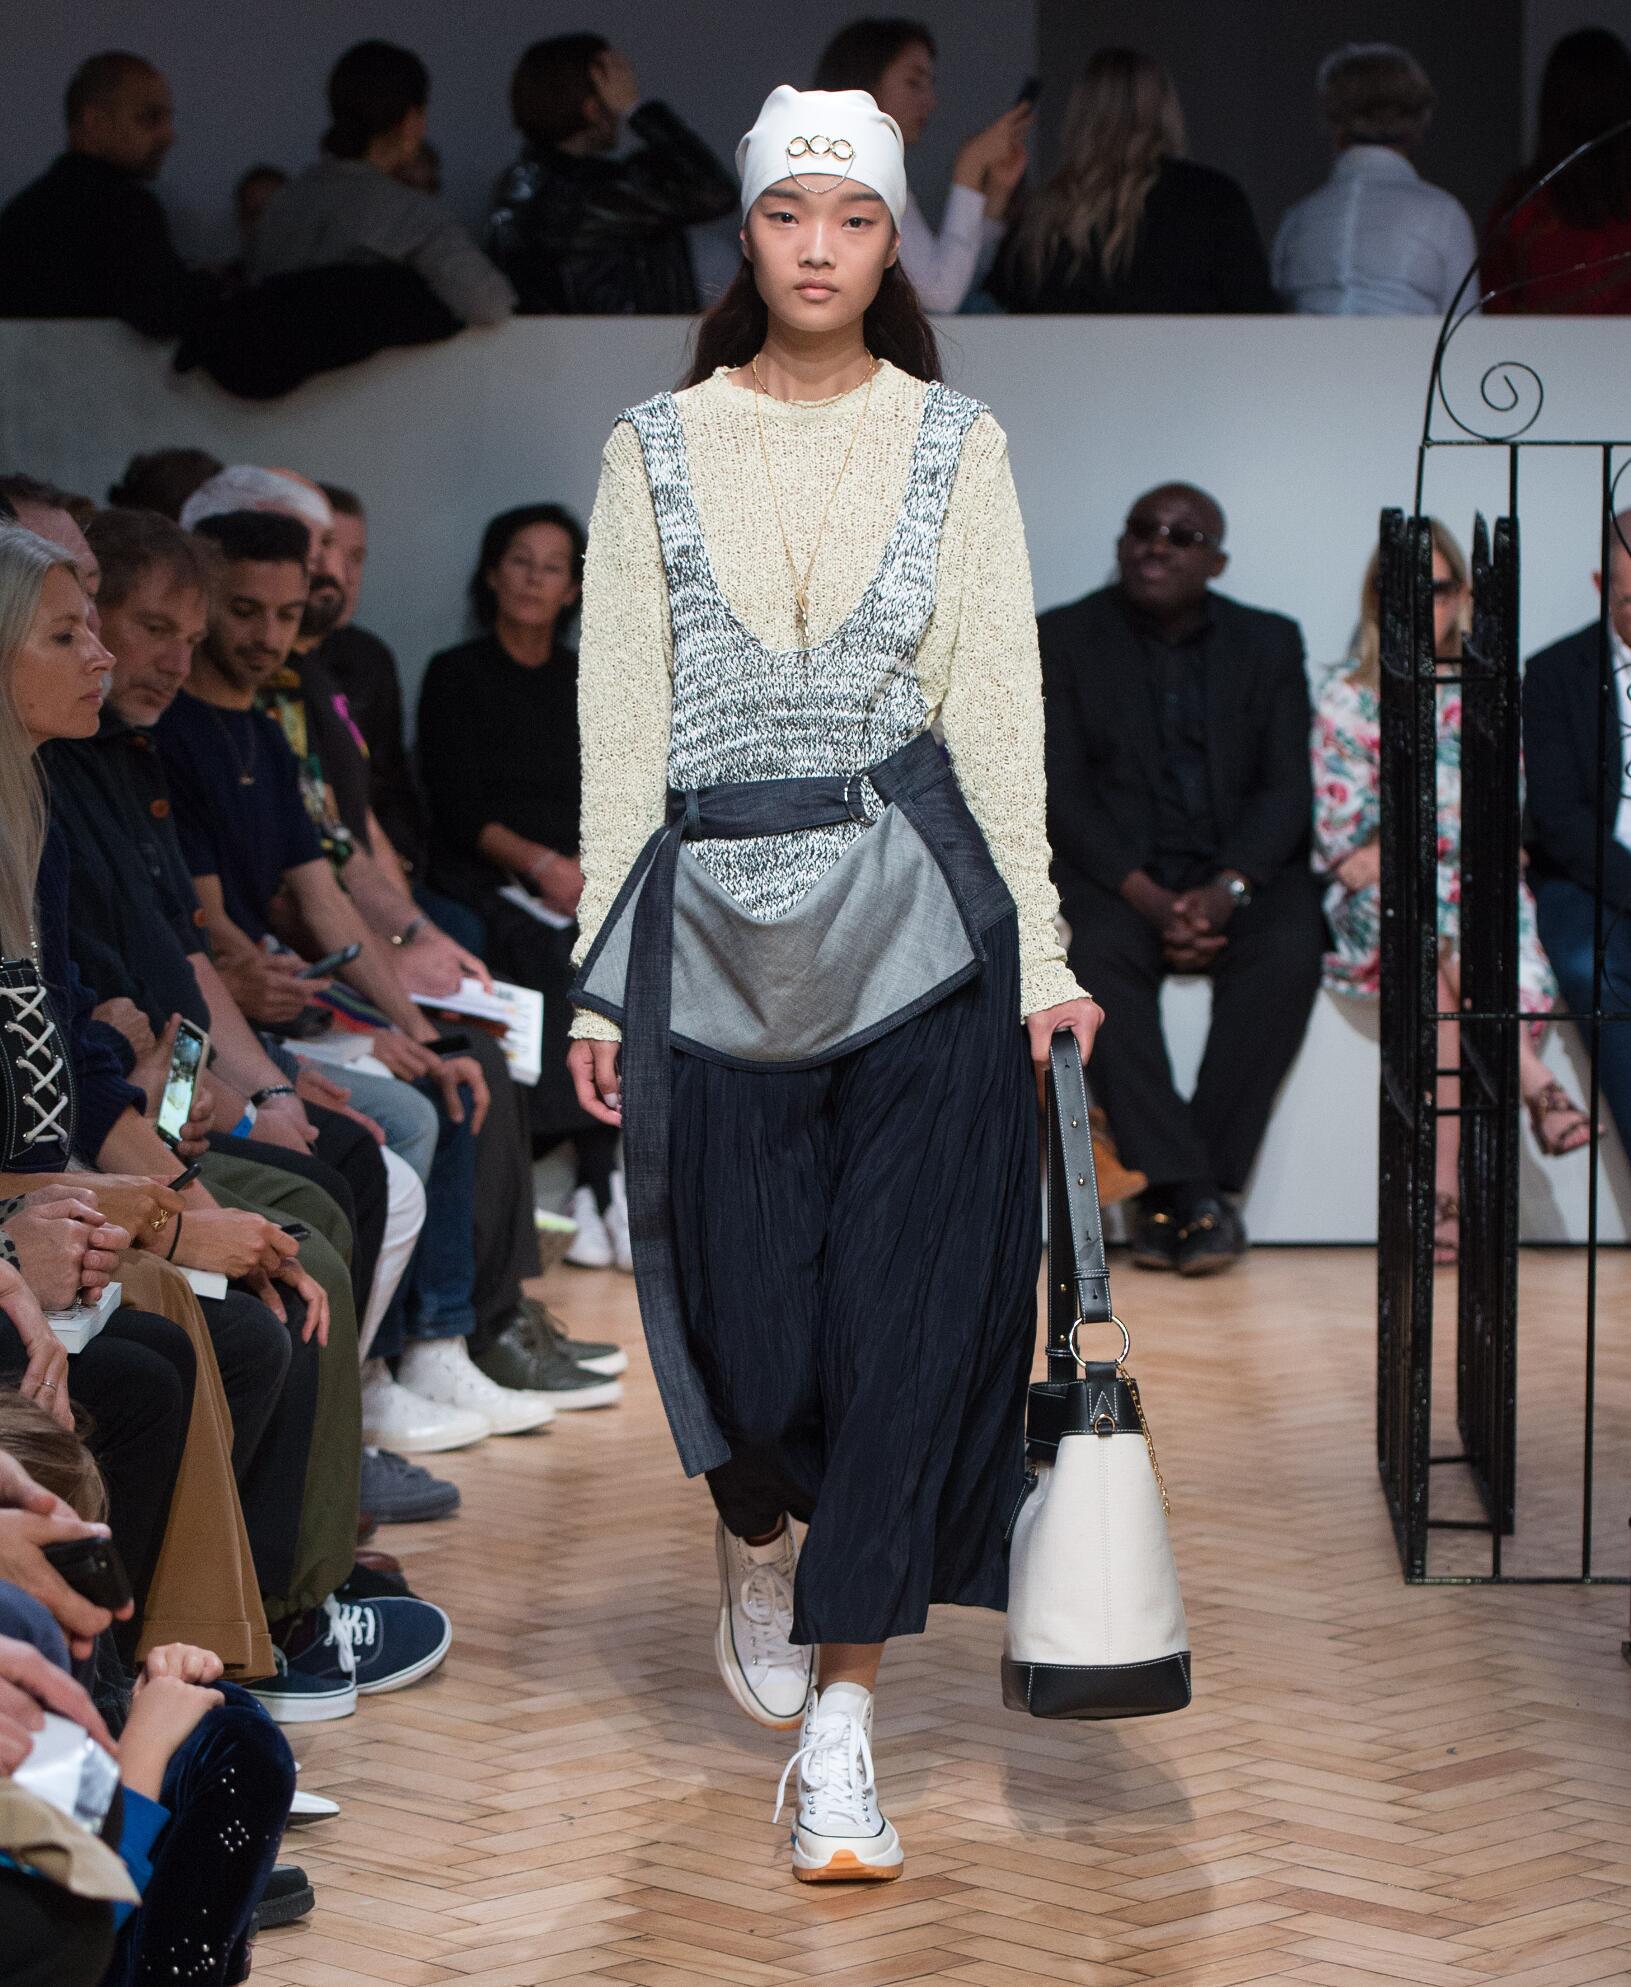 2019 Catwalk J.W. Anderson Woman Fashion Show Summer